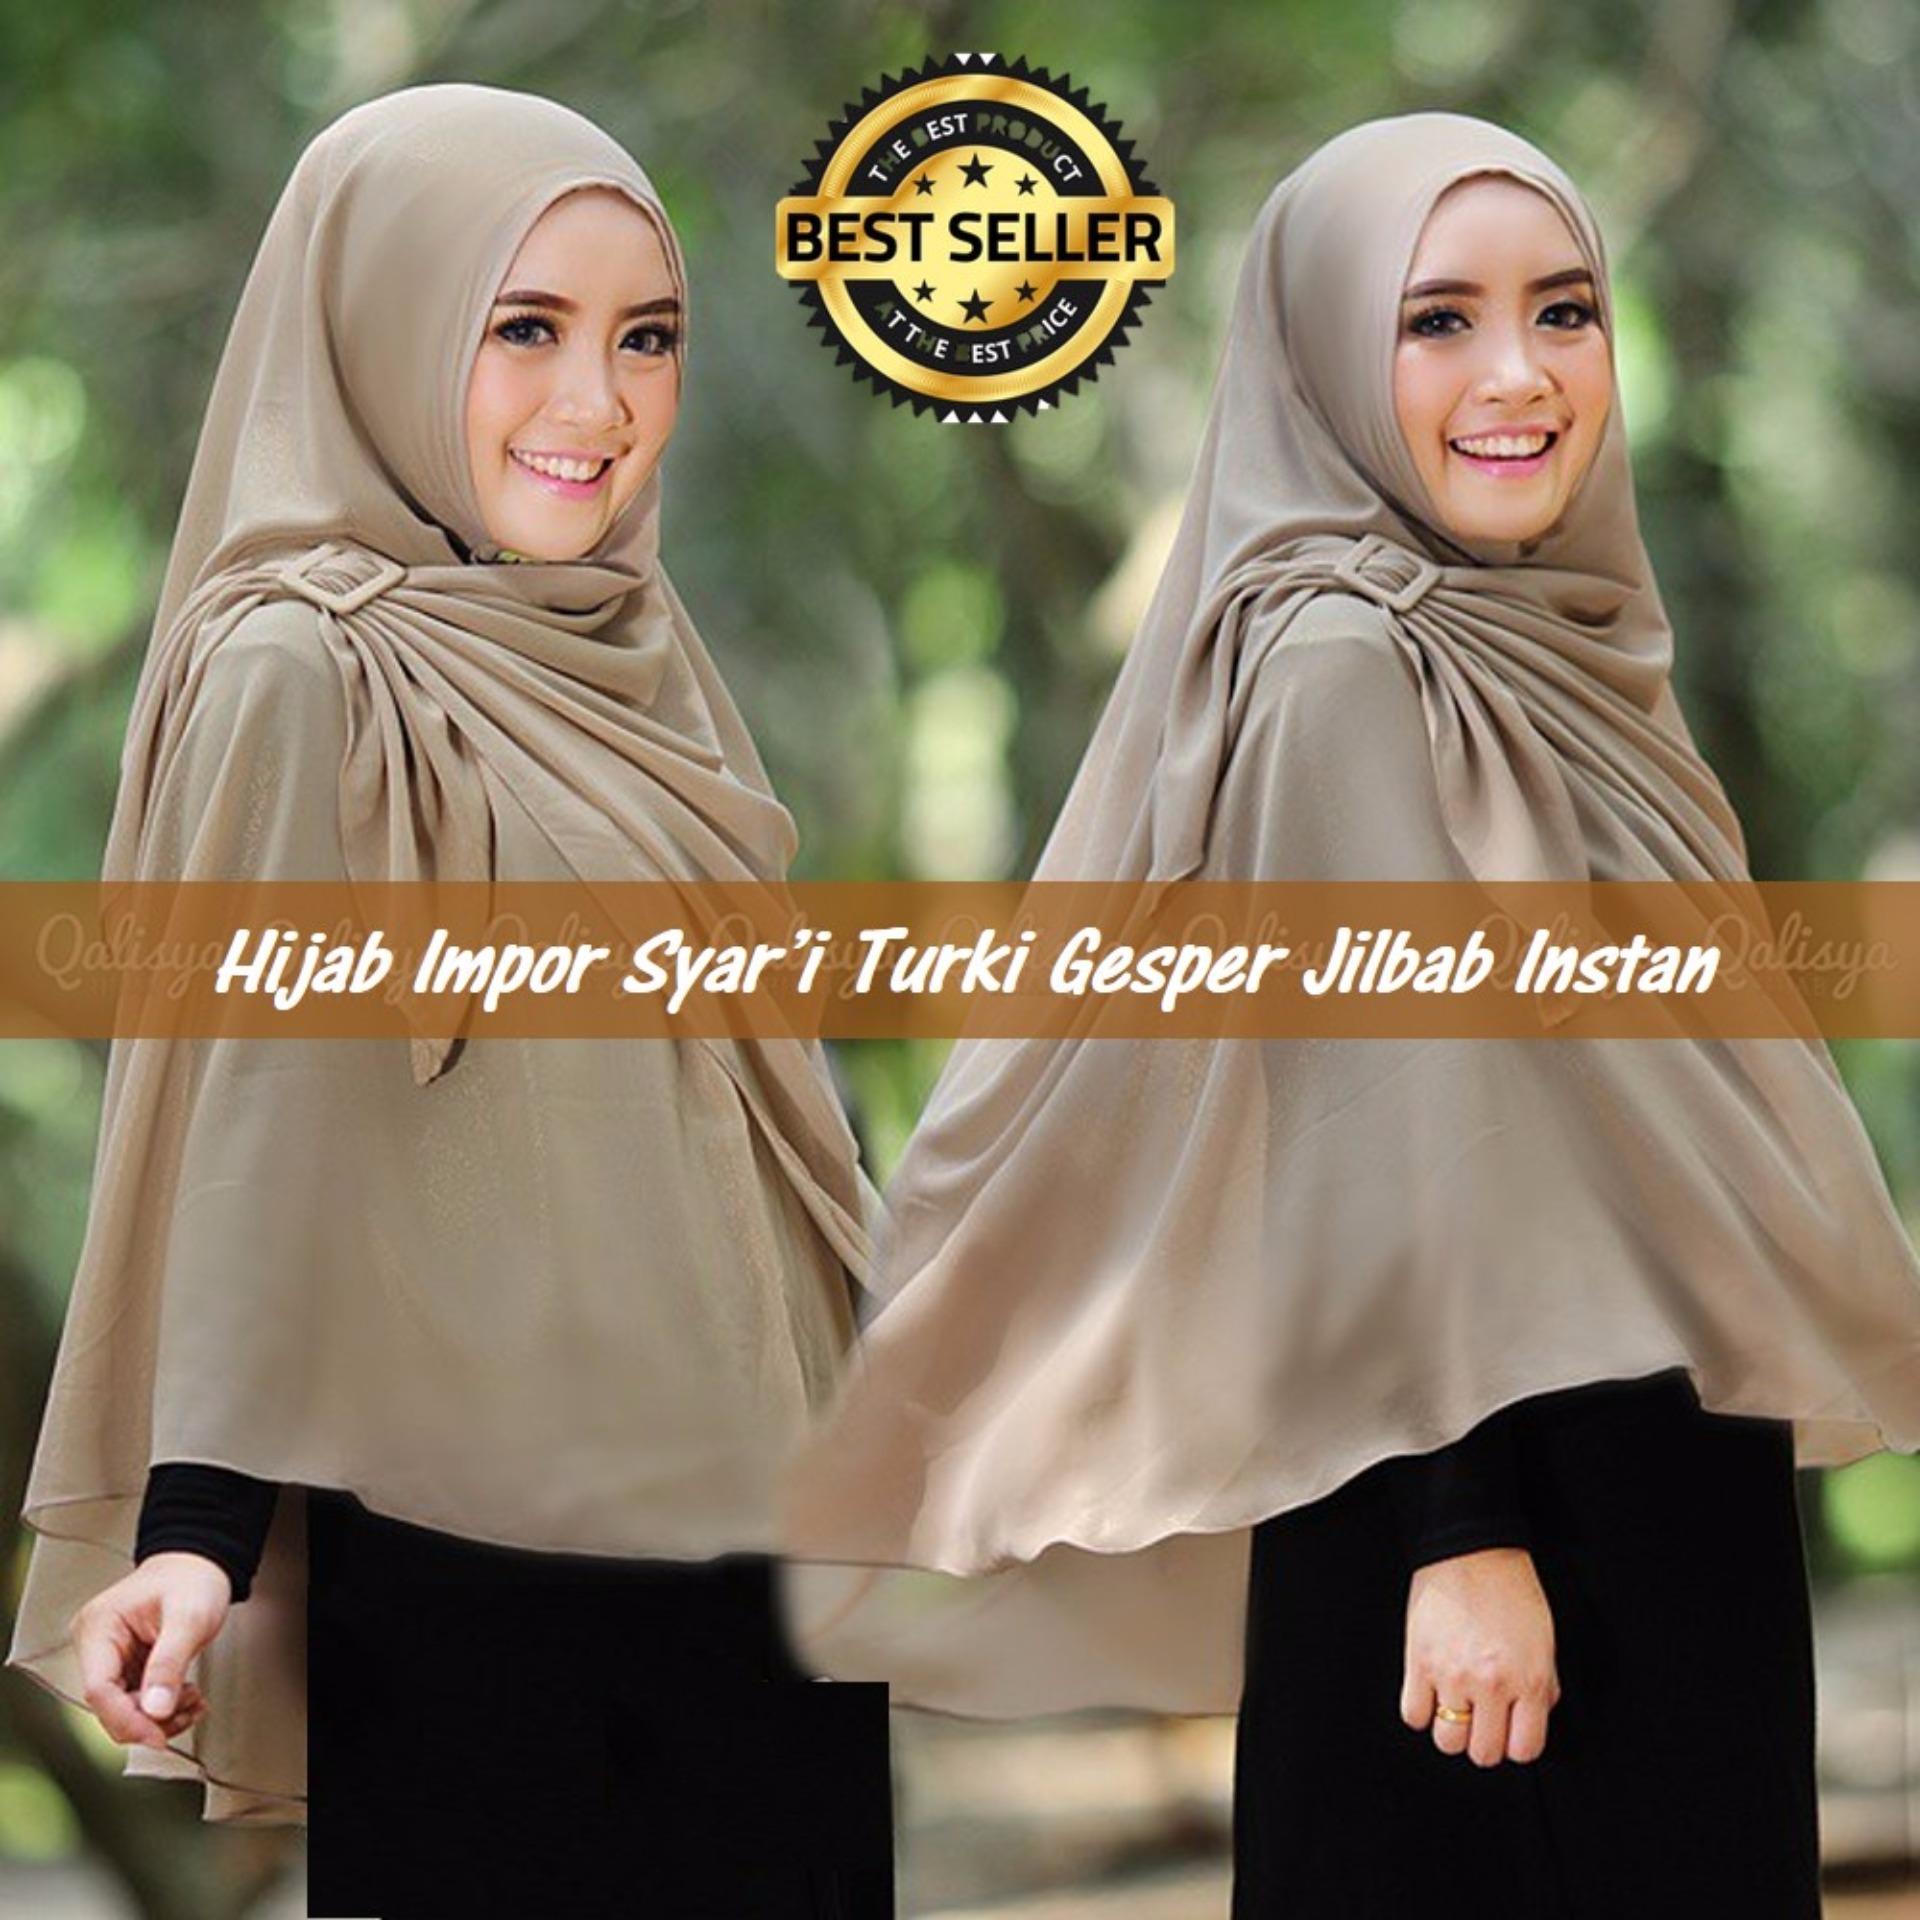 Harga Diskon Promo Jilbab Kerudung Hijab Khimar Syari Bergo Jumbo Instan Rempel Tidak Mudah Kusut Premium Impor Turki Gesper Instant Coksu